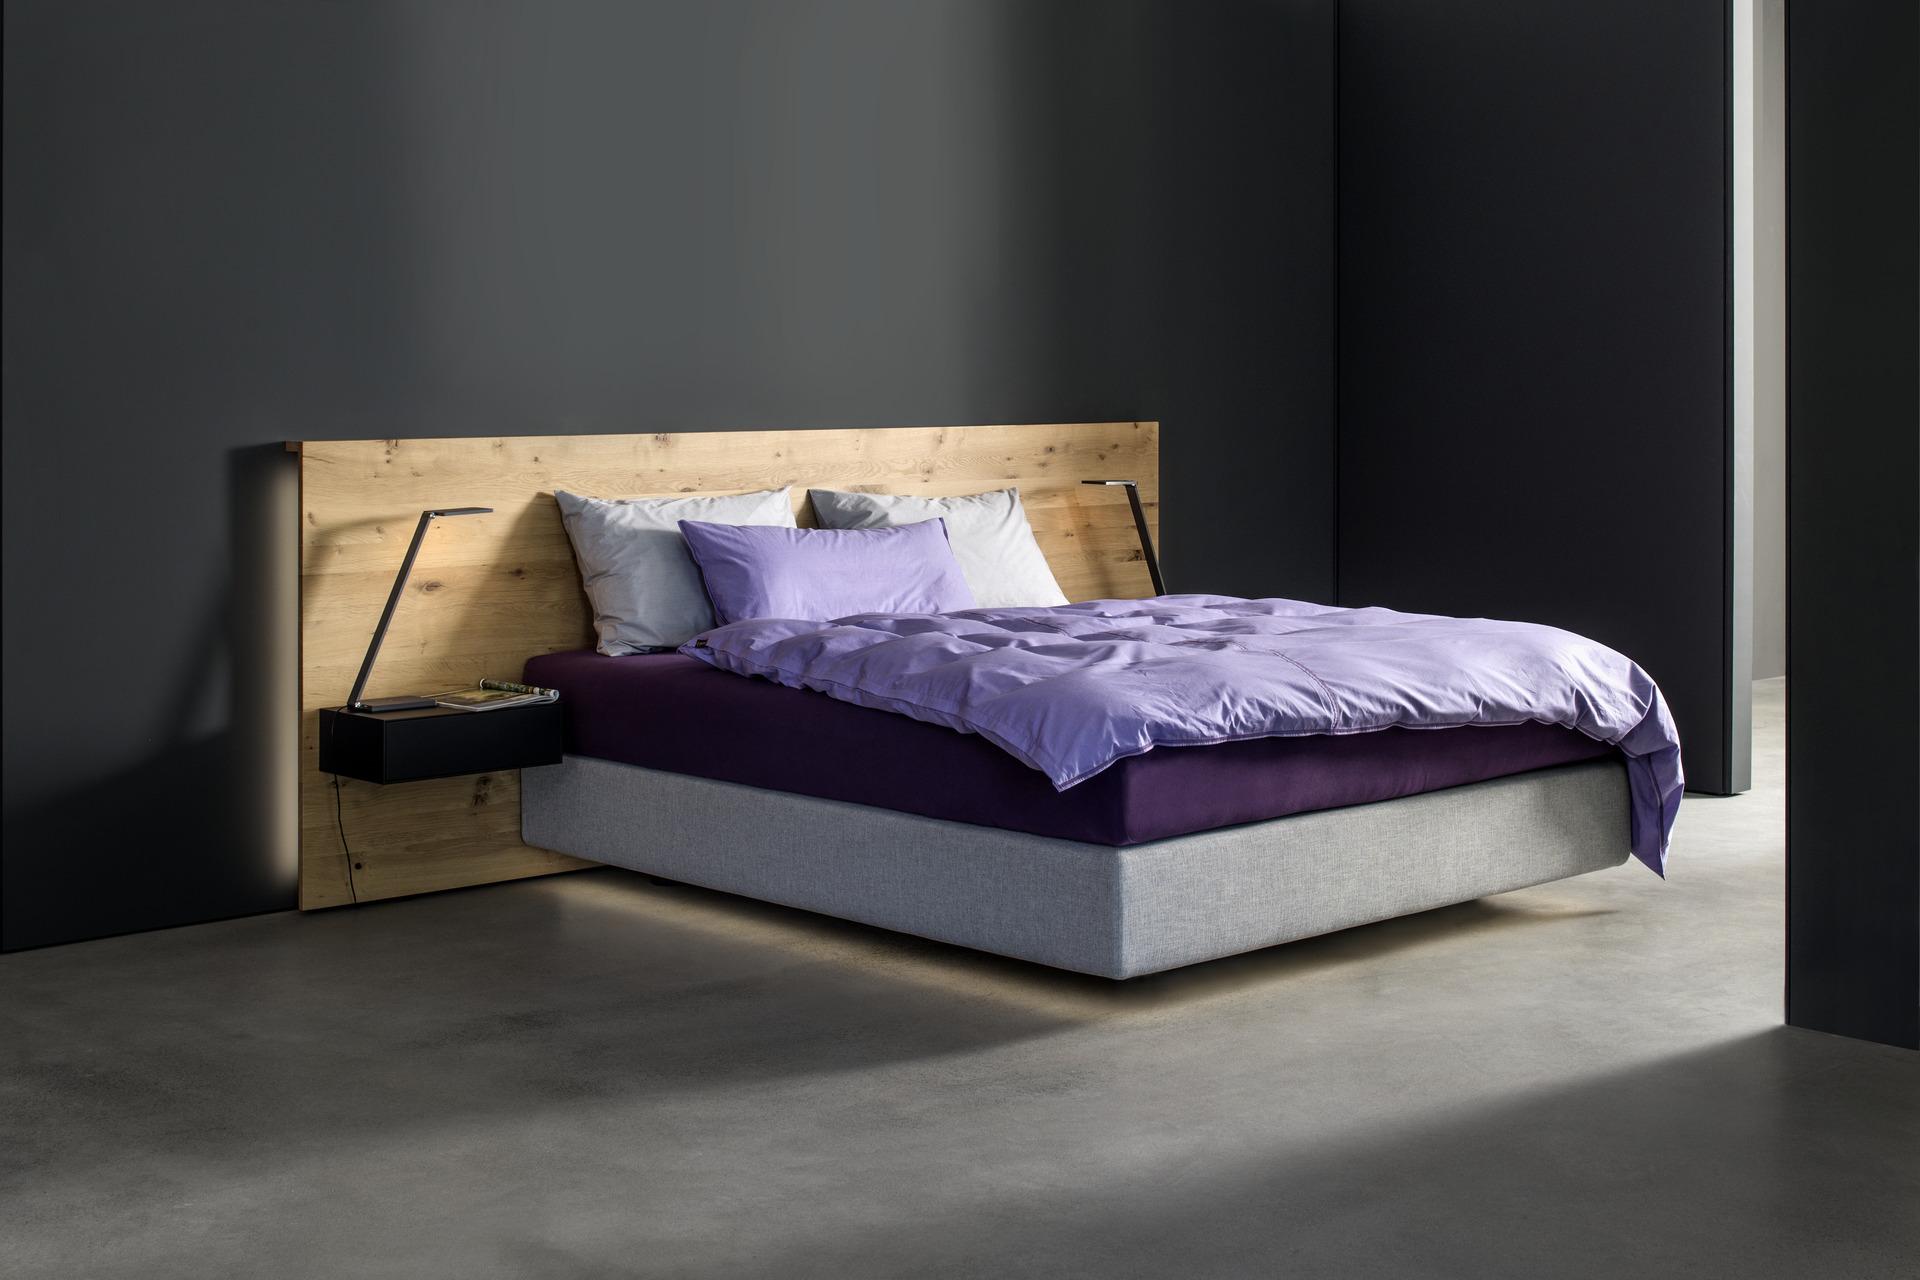 wandpaneel bett wandpaneele mit steinoptik fr die wand. Black Bedroom Furniture Sets. Home Design Ideas